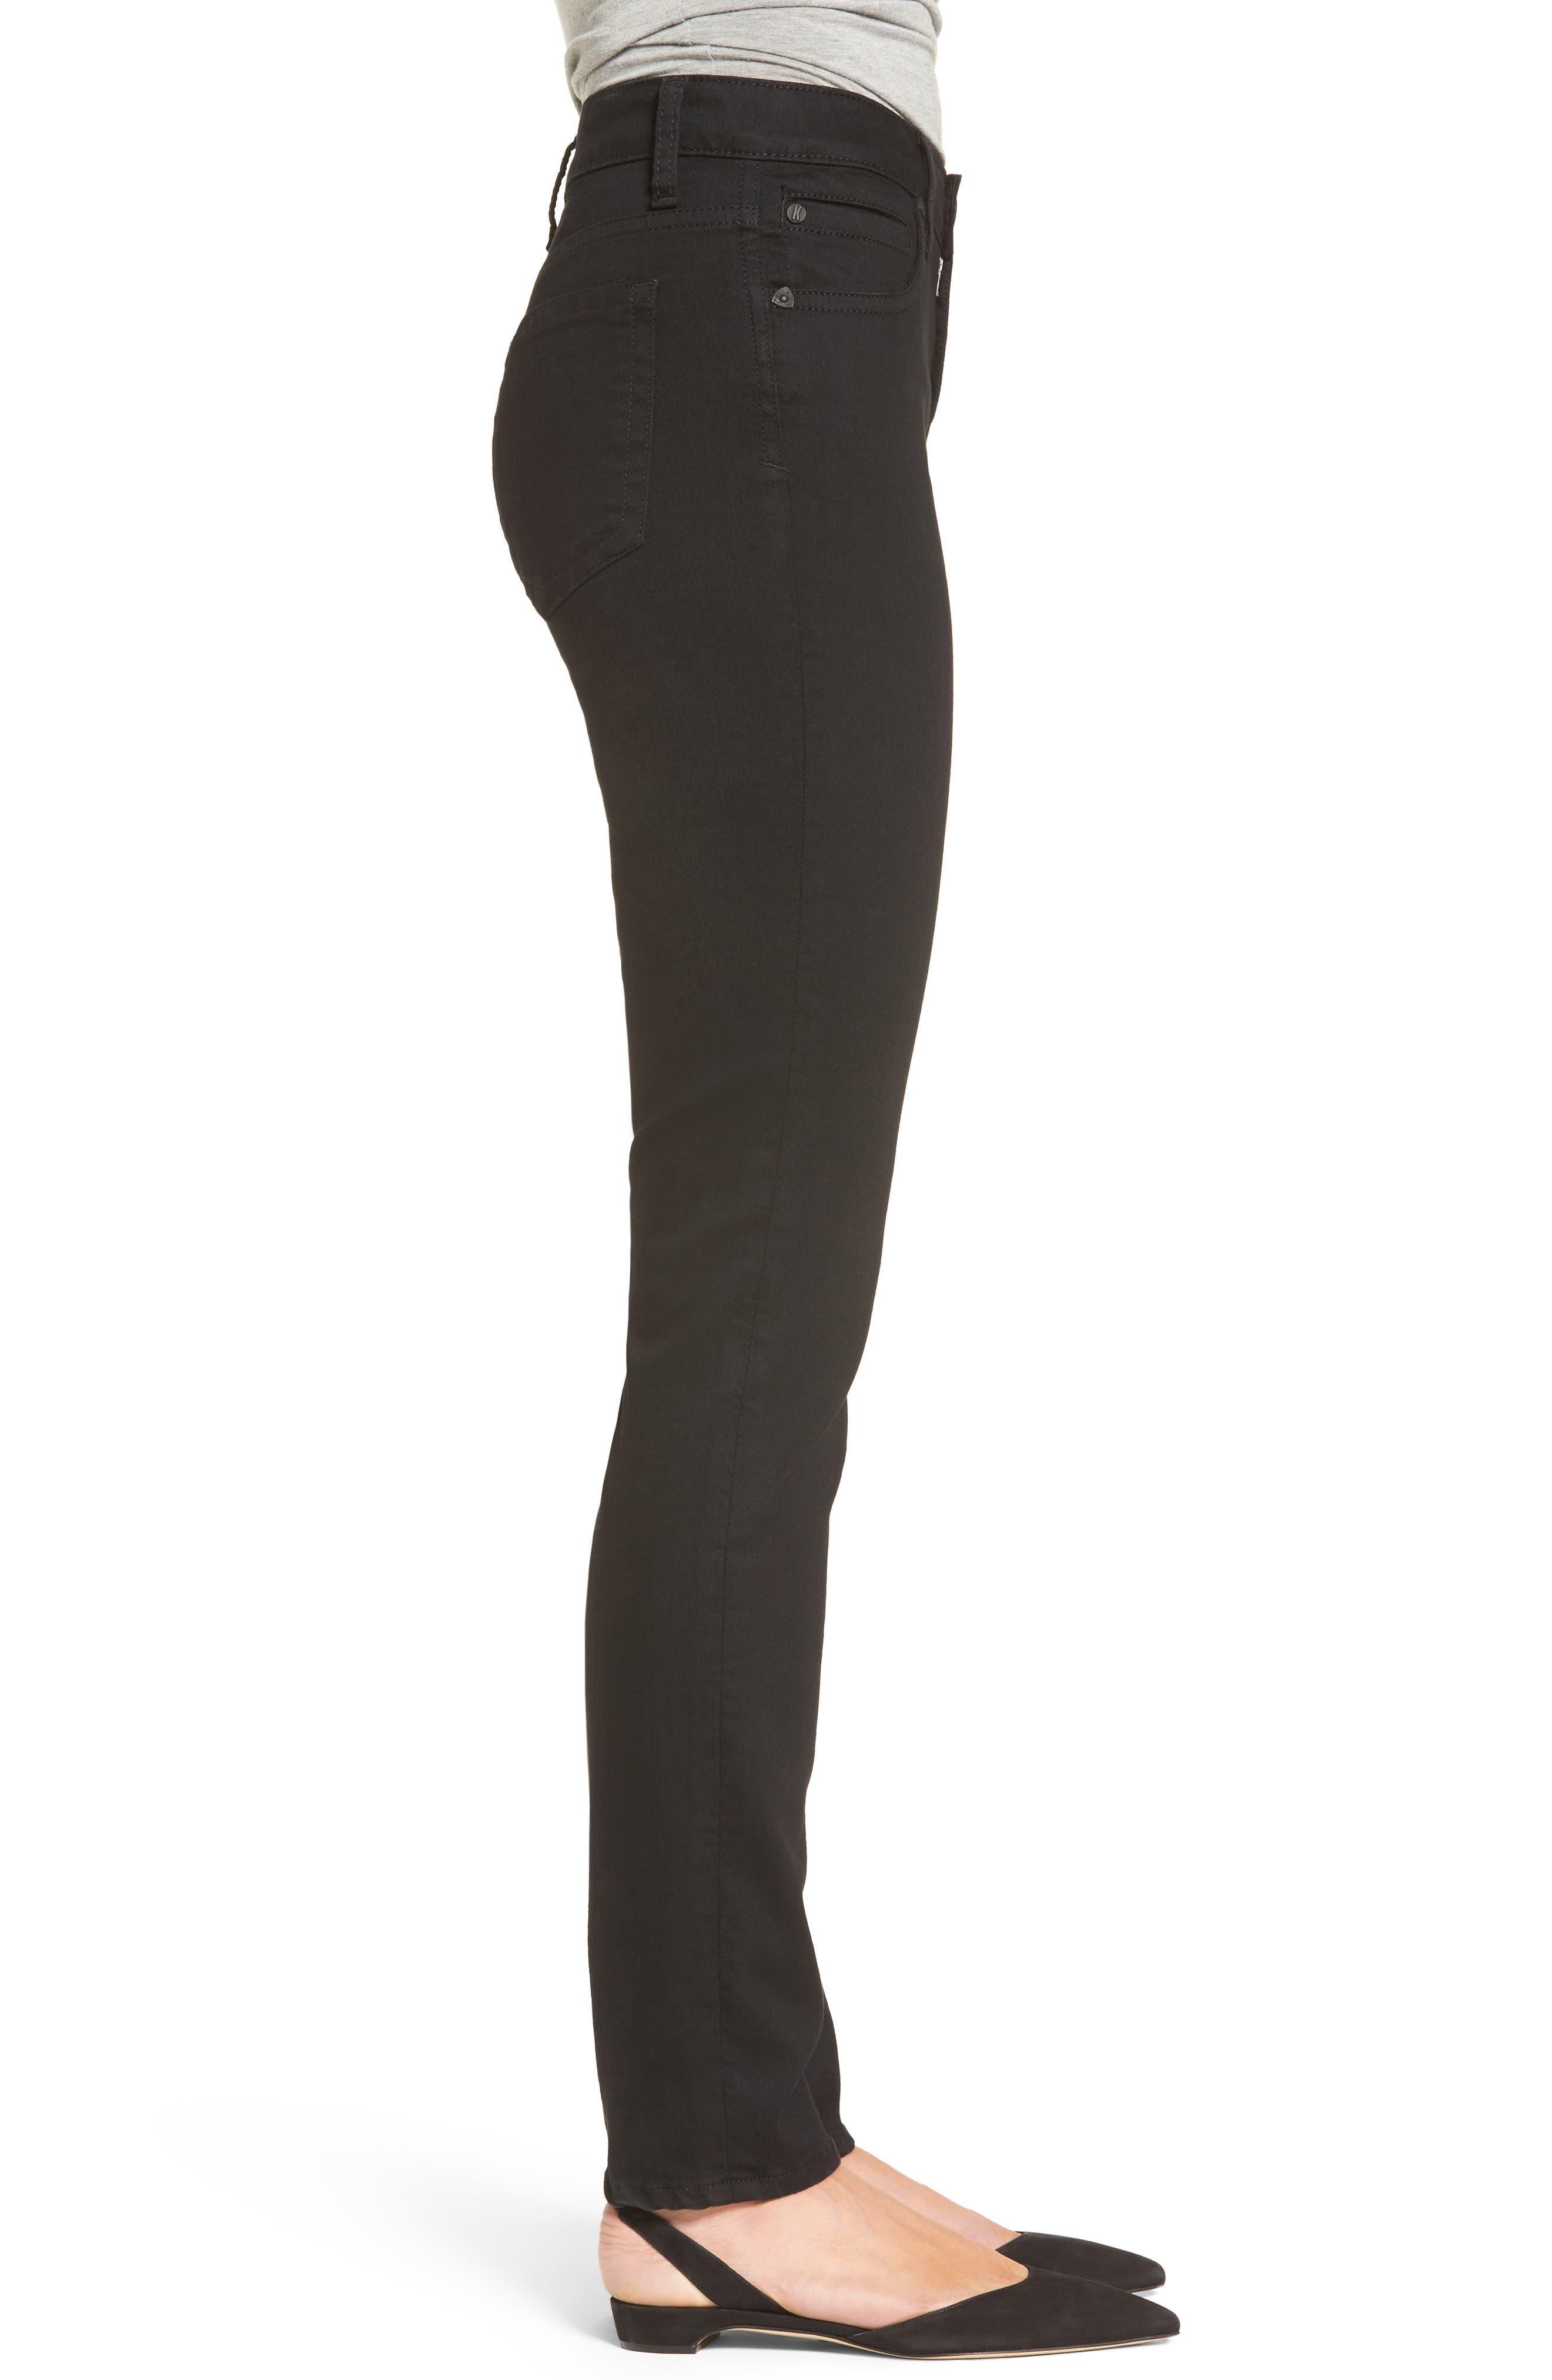 Alternate Image 3  - KUT from the Kloth Diana Stretch Skinny Jeans (Regular & Petite)